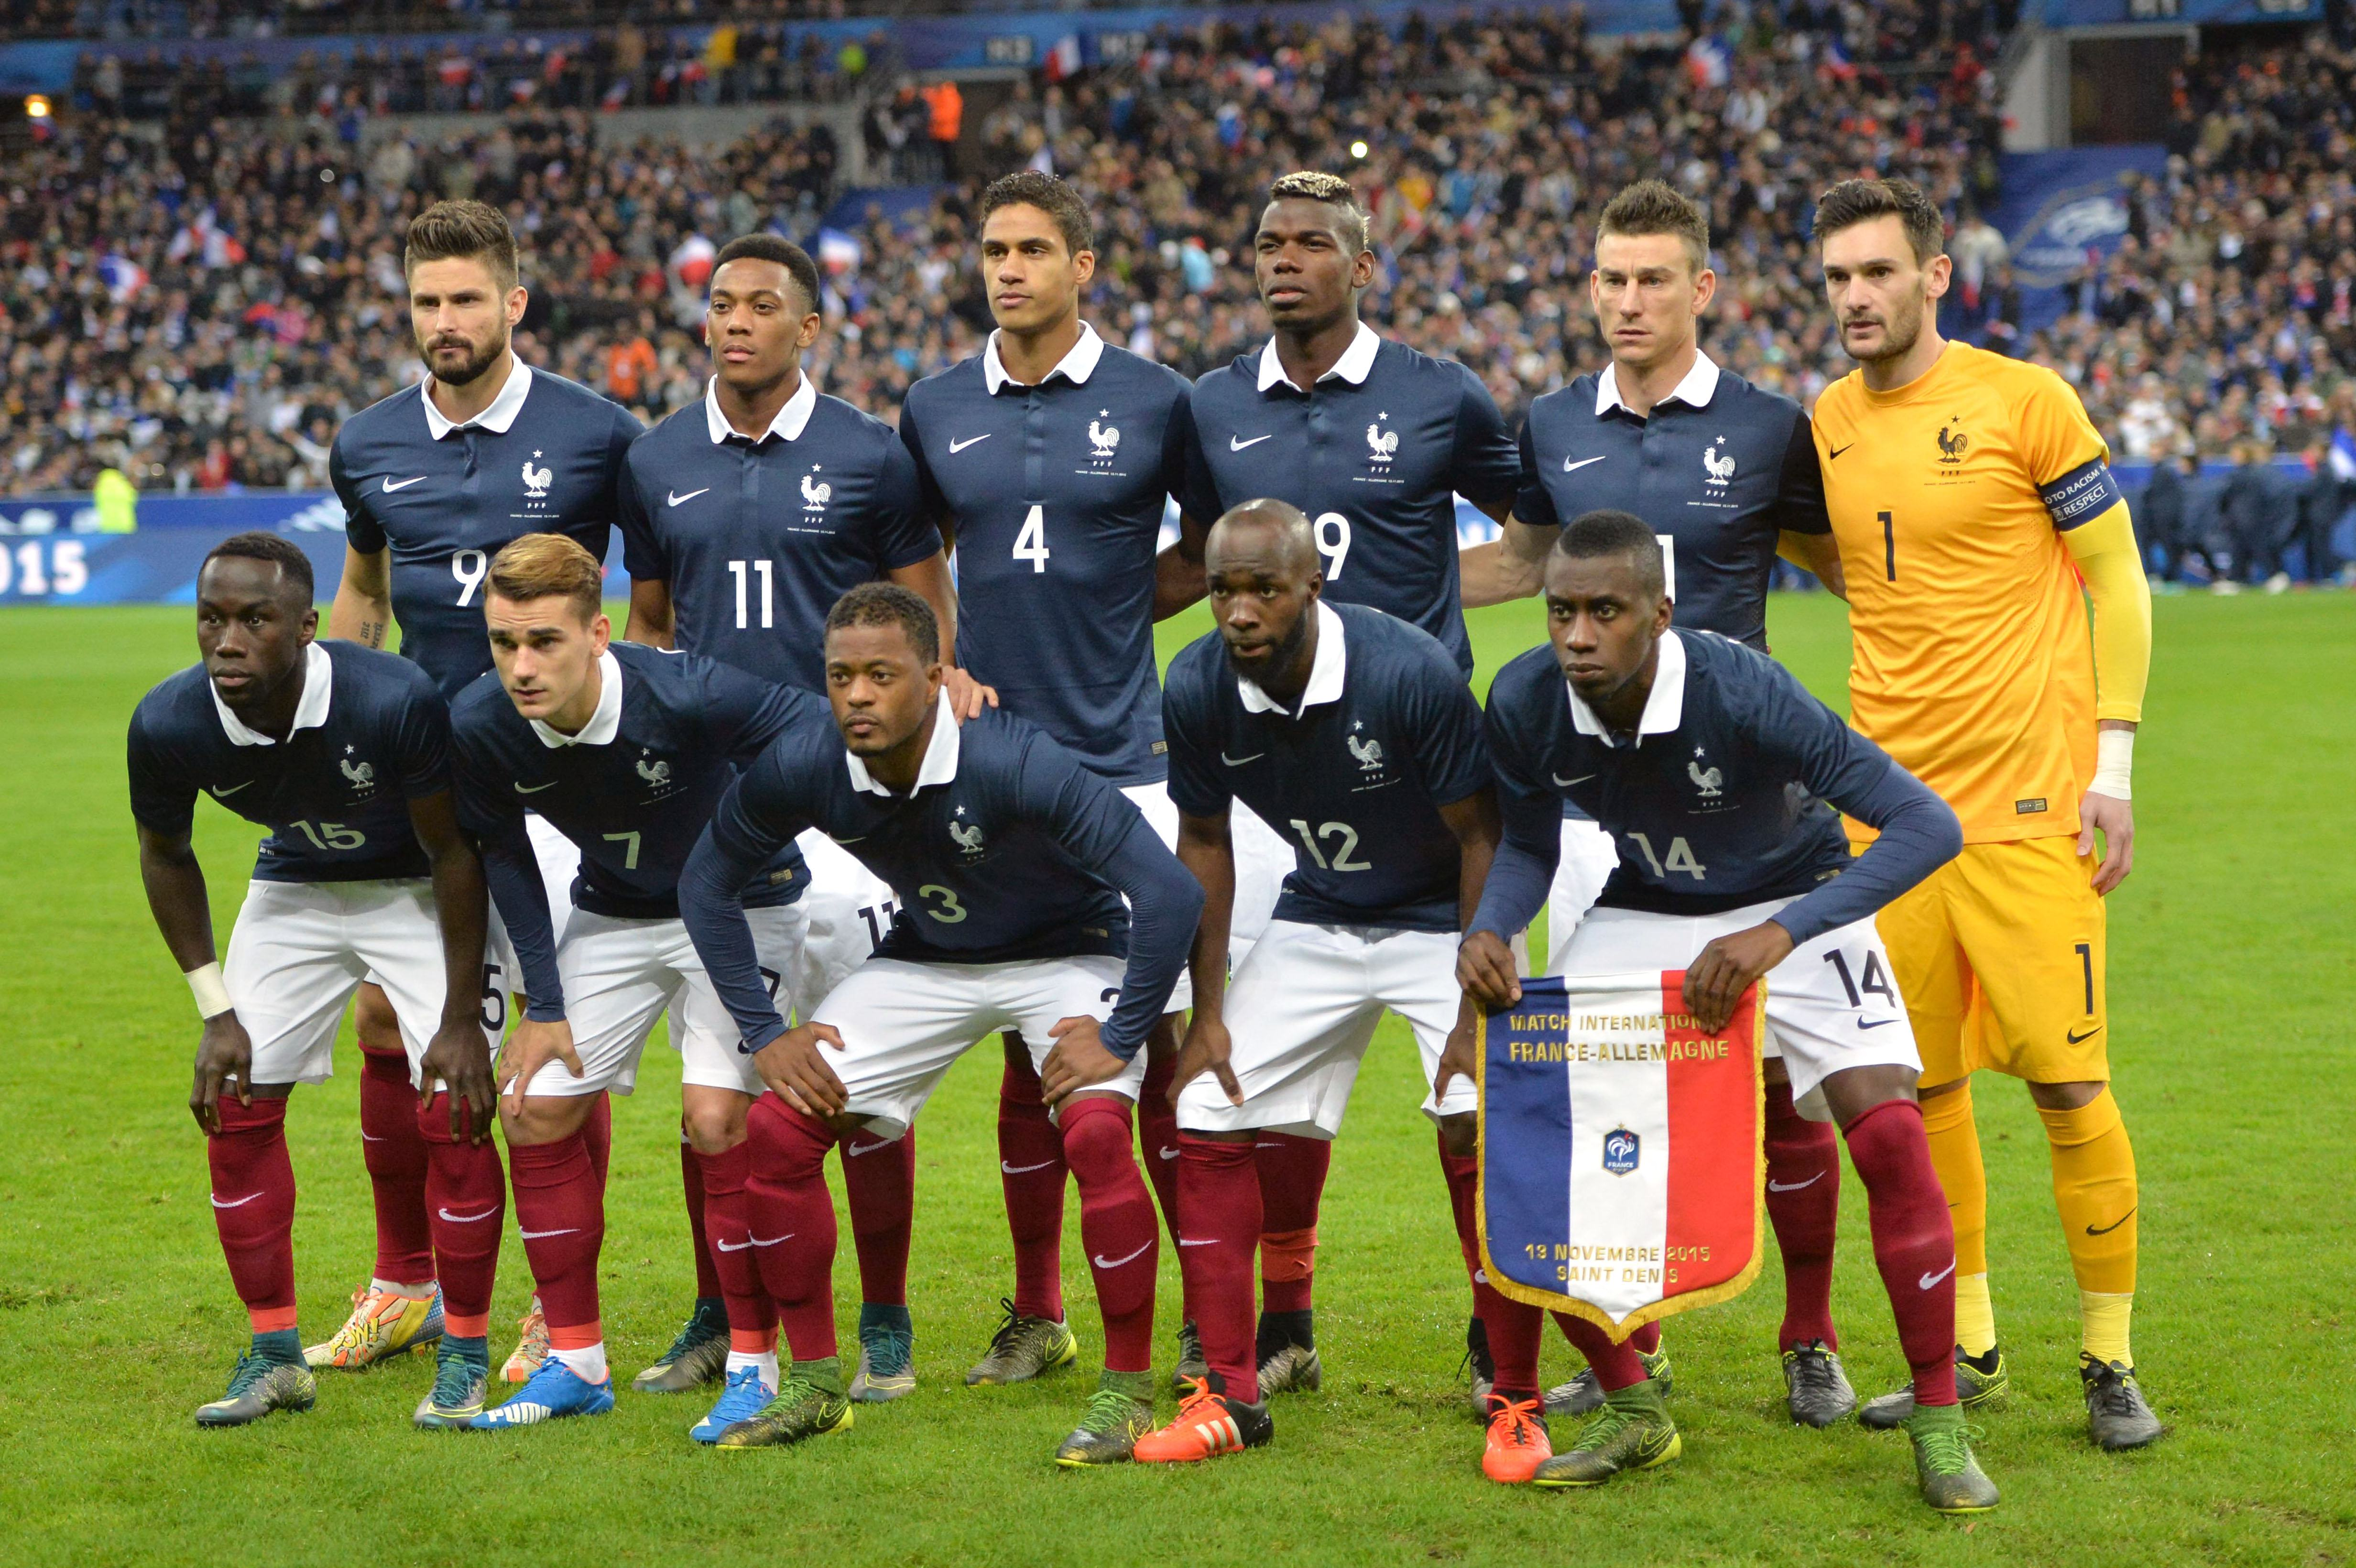 Malgr les attentats le match angleterre france maintenu - Resultat coupe de france football 2015 ...